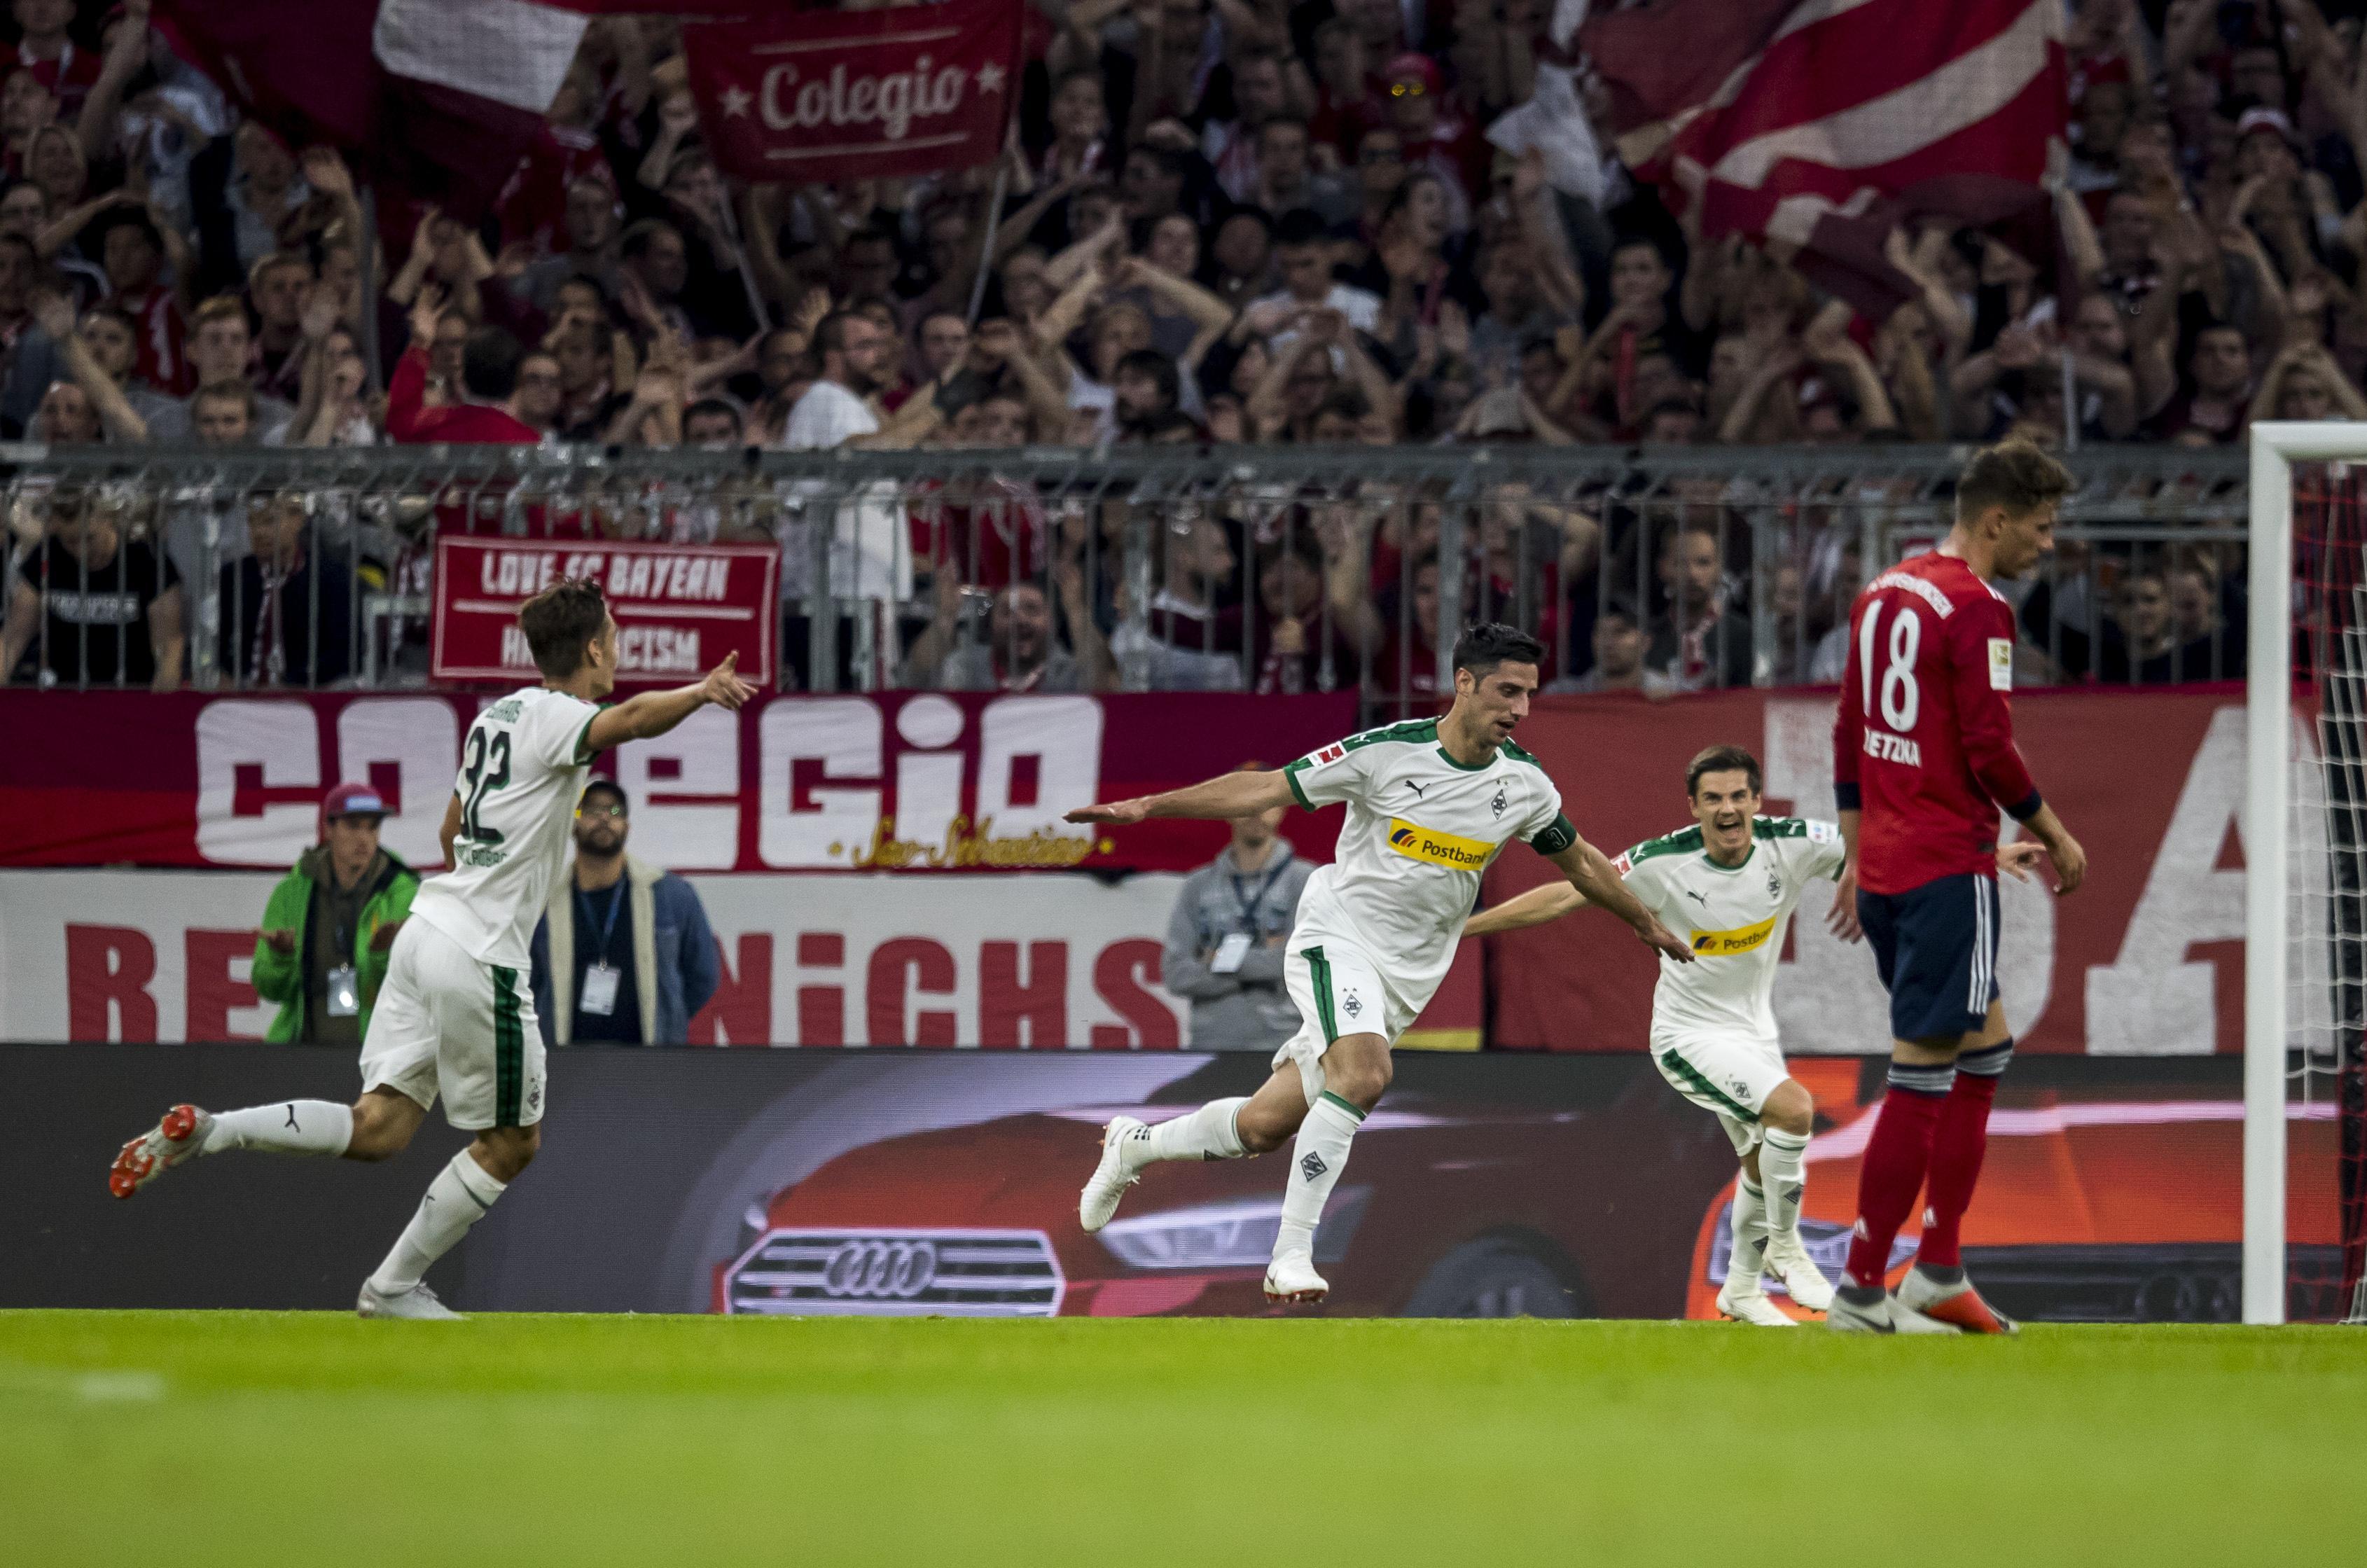 Monchengladbach battered Bayern 3-0 at the weekend